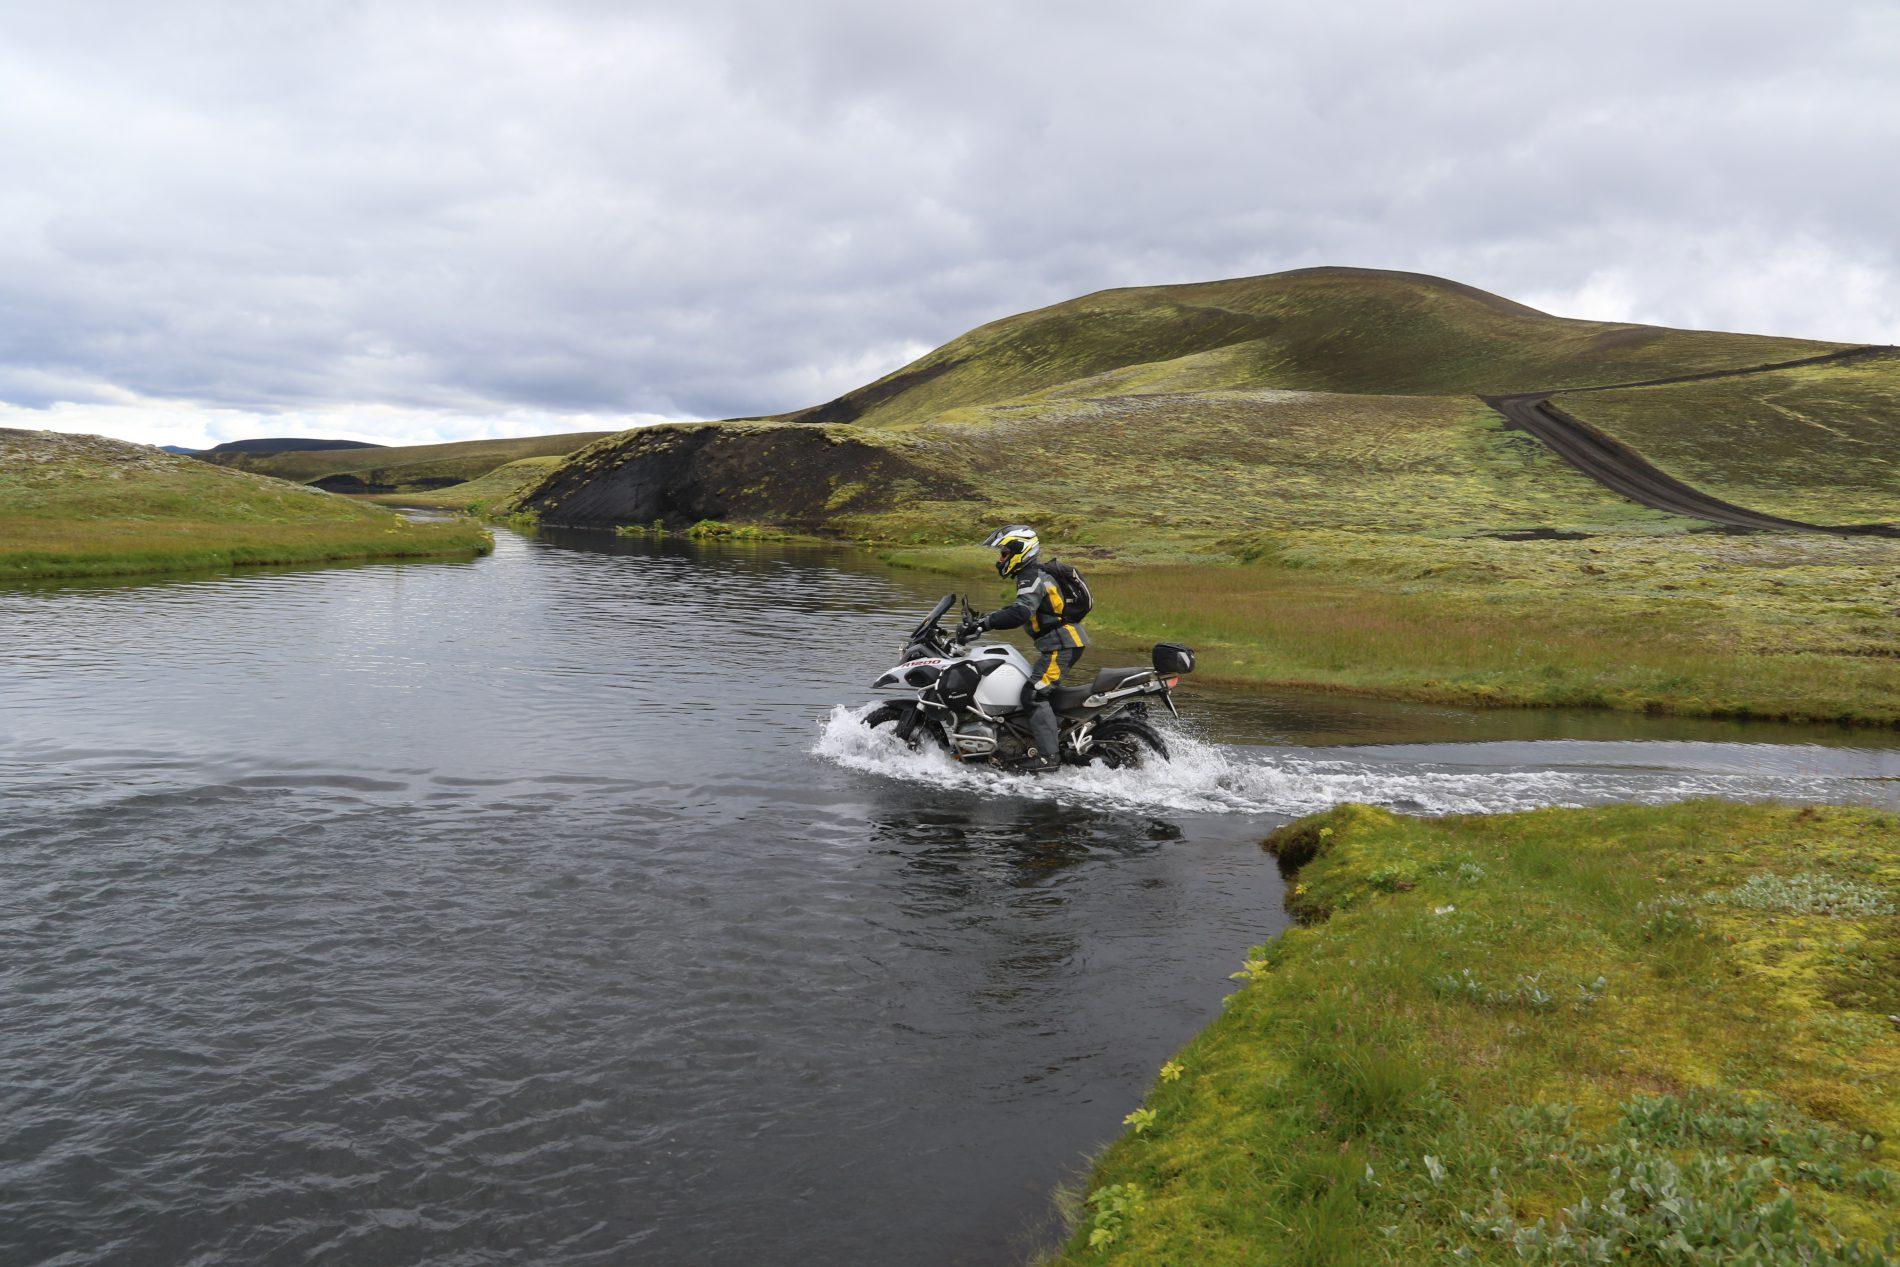 Touratech Experience - Island körning i vatten